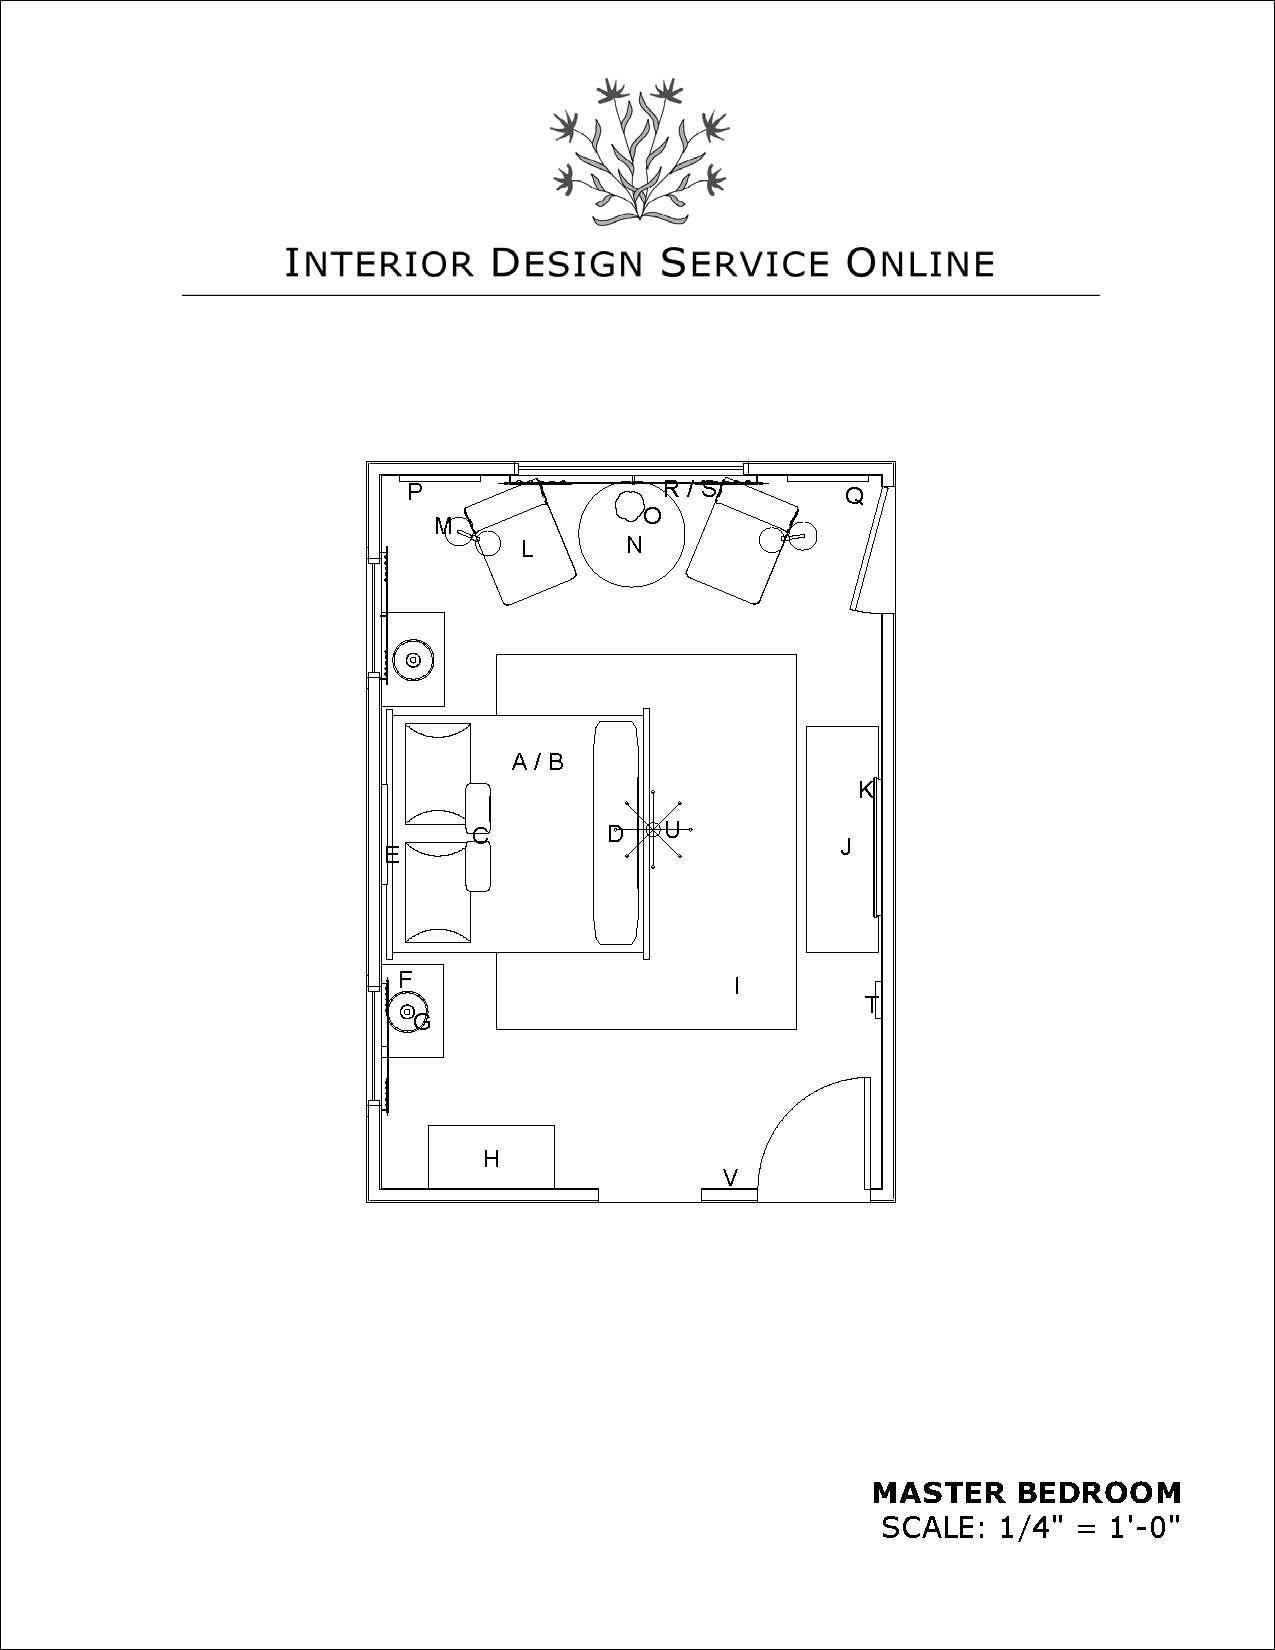 Master bedroom furniture layout  eriordesignserviceonline Master Bedroom  Rooms